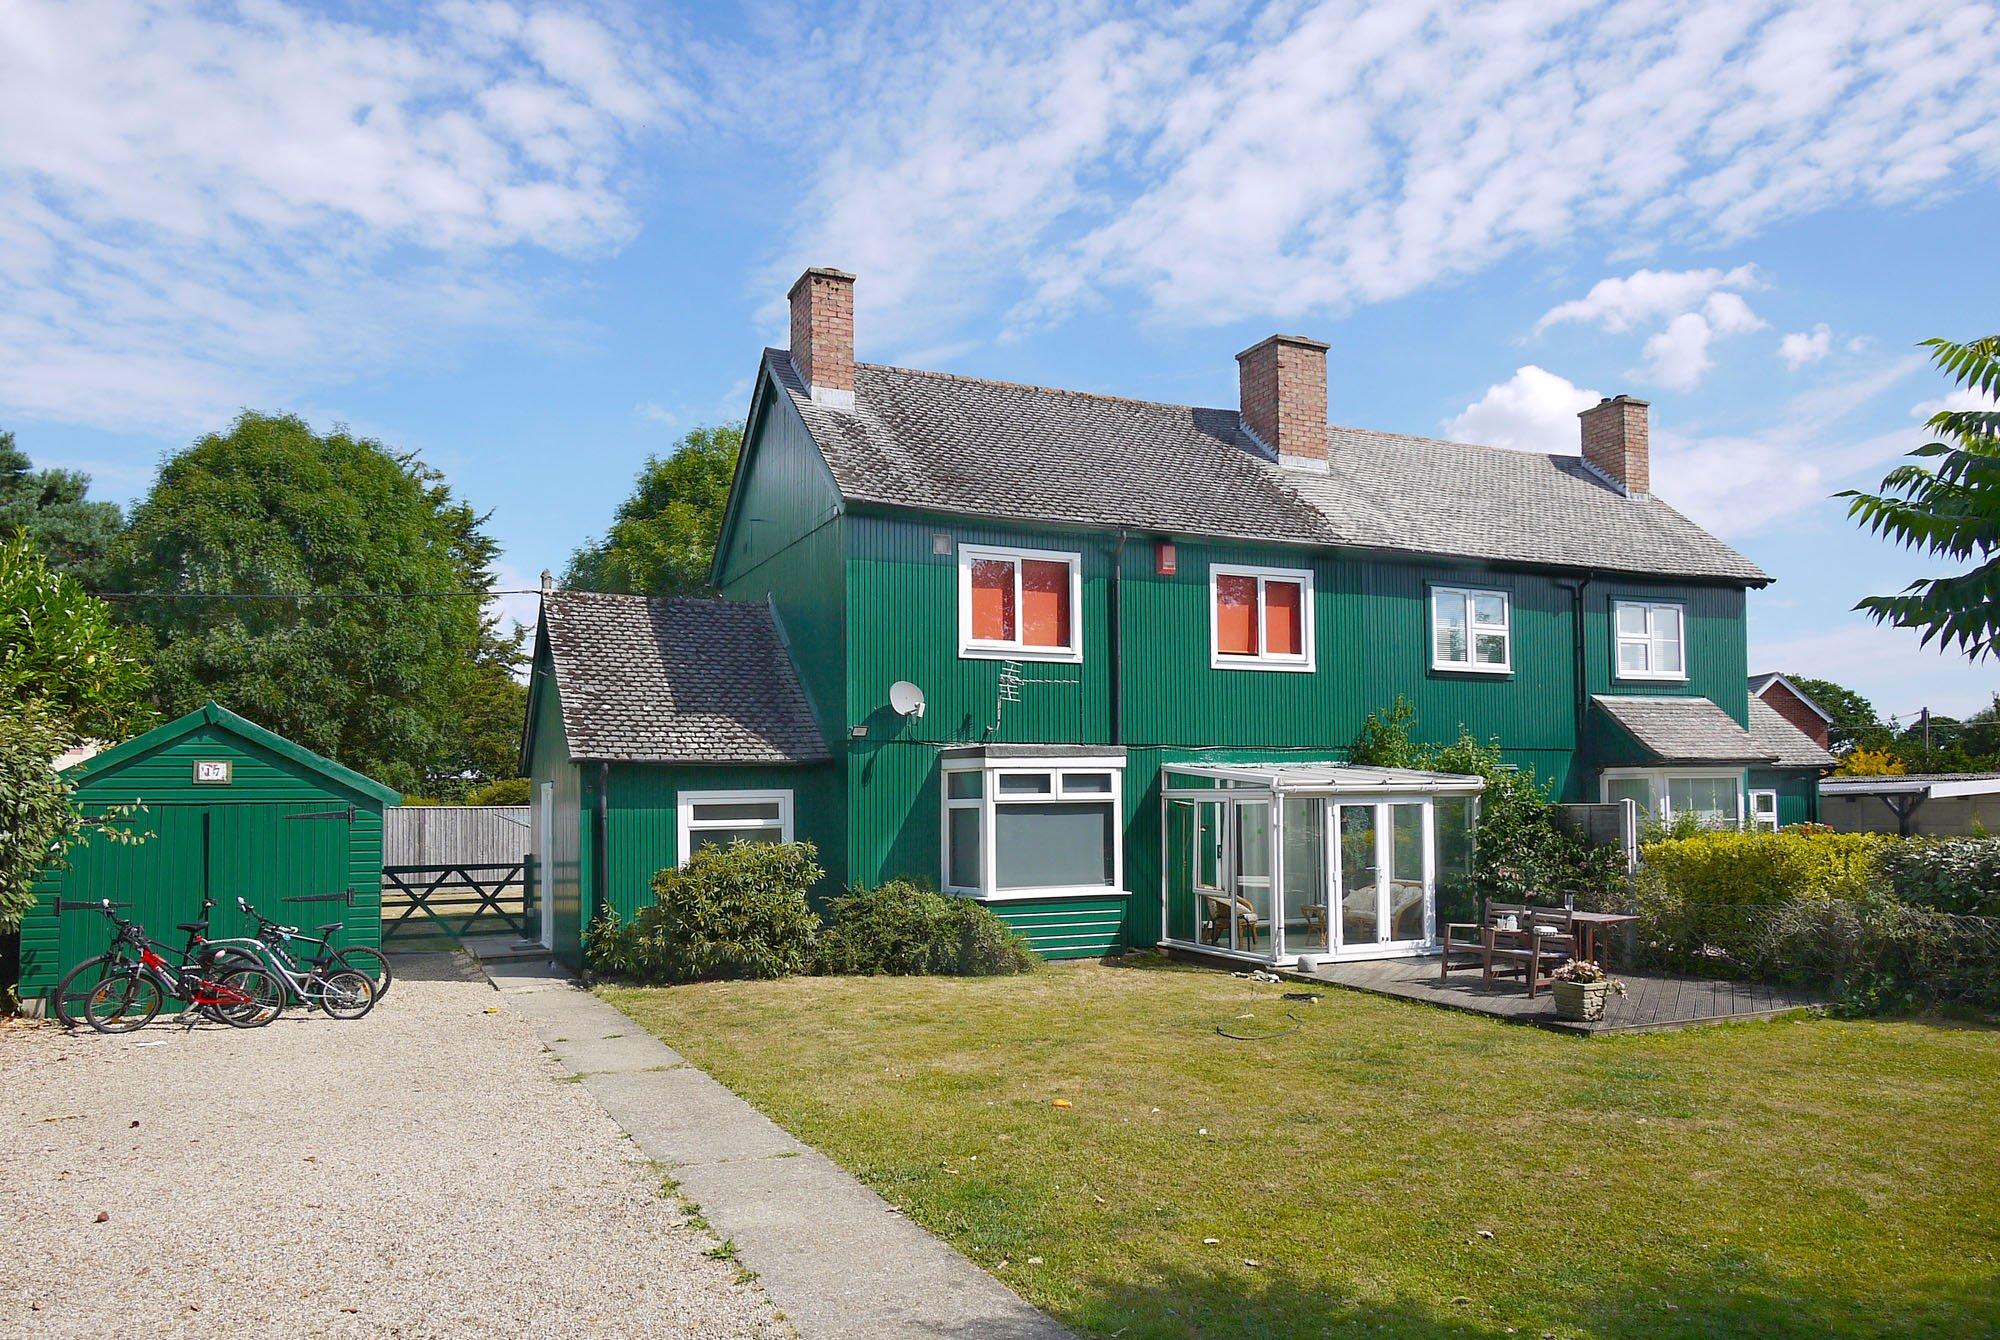 Burnt House Lane Pilley Lymington Hampshire So41 3 Bedroom Semi Fuse Box Home Detached For Sale 48396675 Primelocation